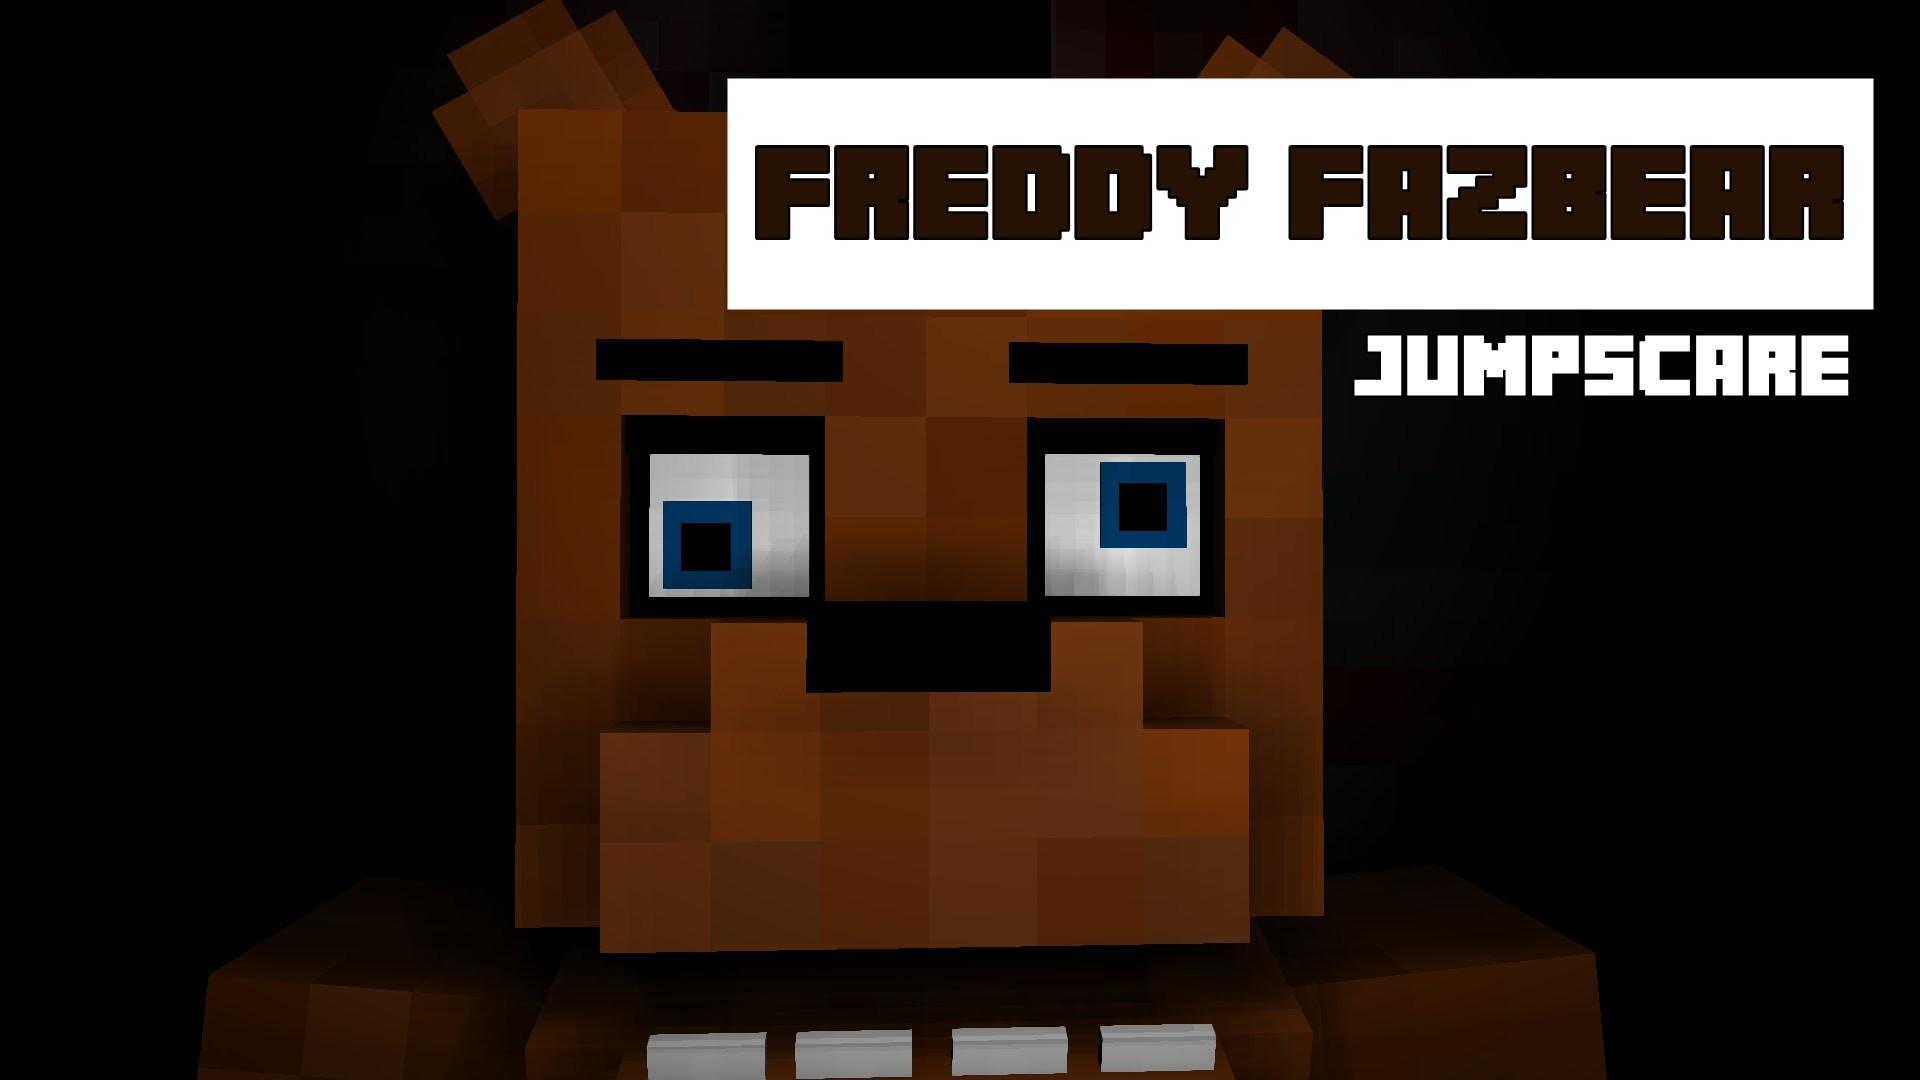 [Five nights at Minecraft]-Freddy Fazbear Jumpscare